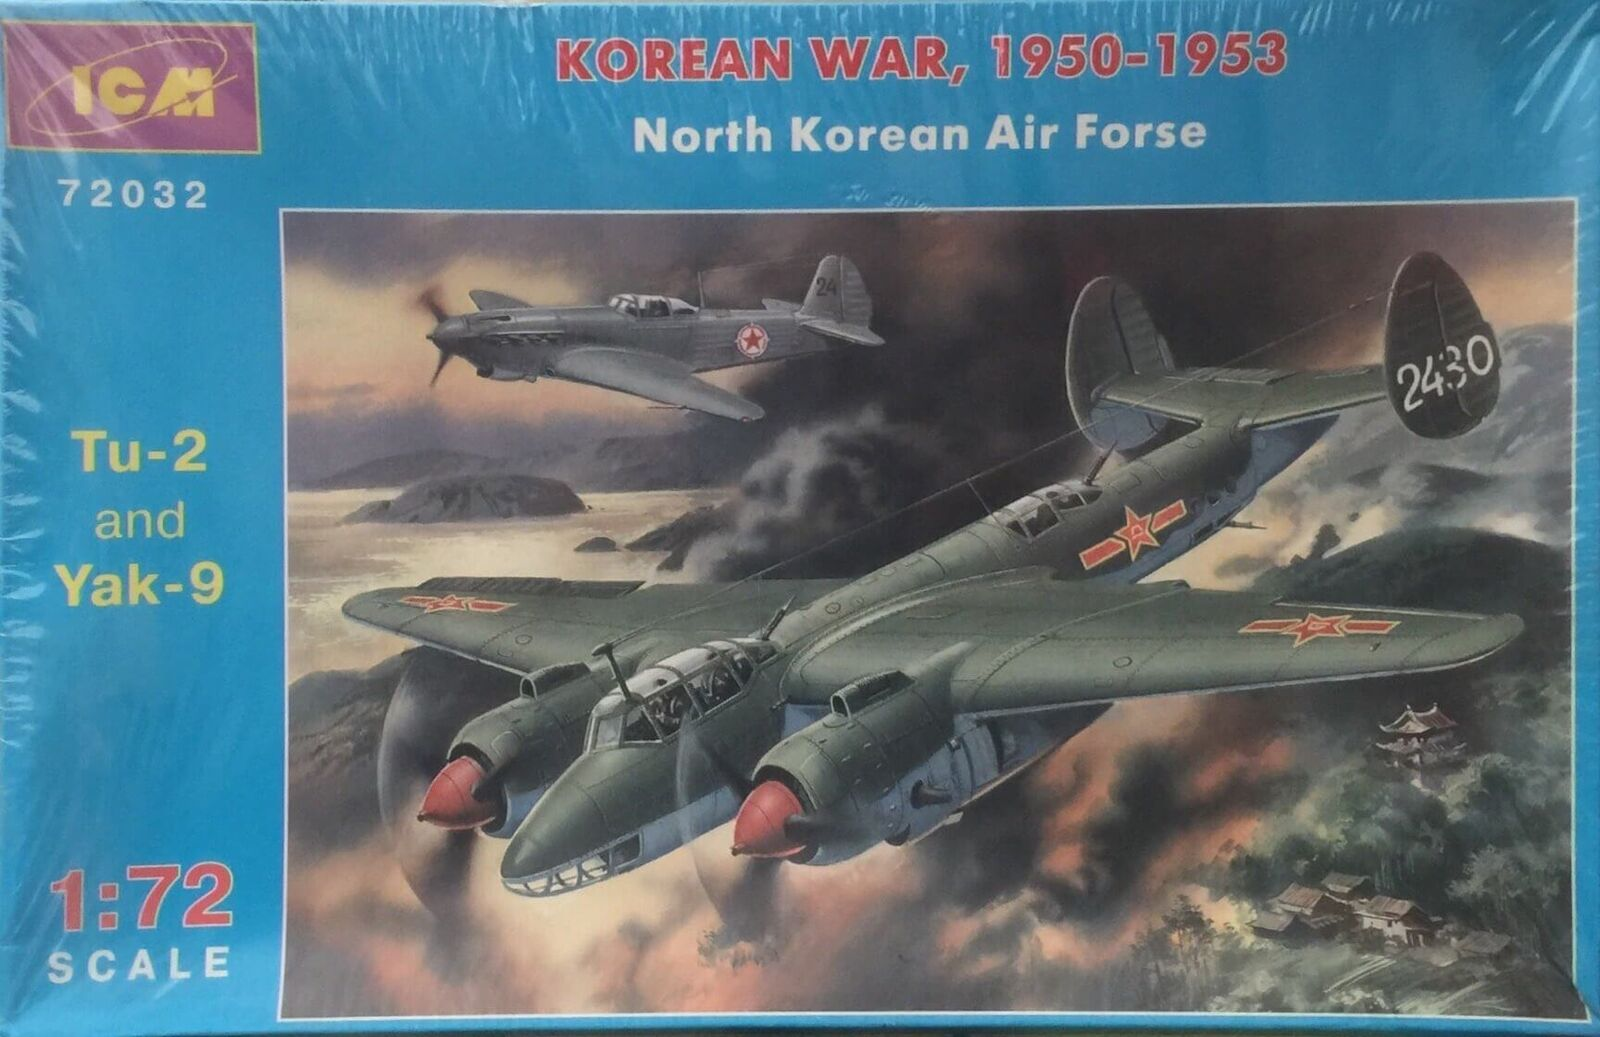 ICM Korean War 1950-1953 Tu-2 and Yak-9 Yak-9 Yak-9 Ref 72032 Escala 1/72 1981ca